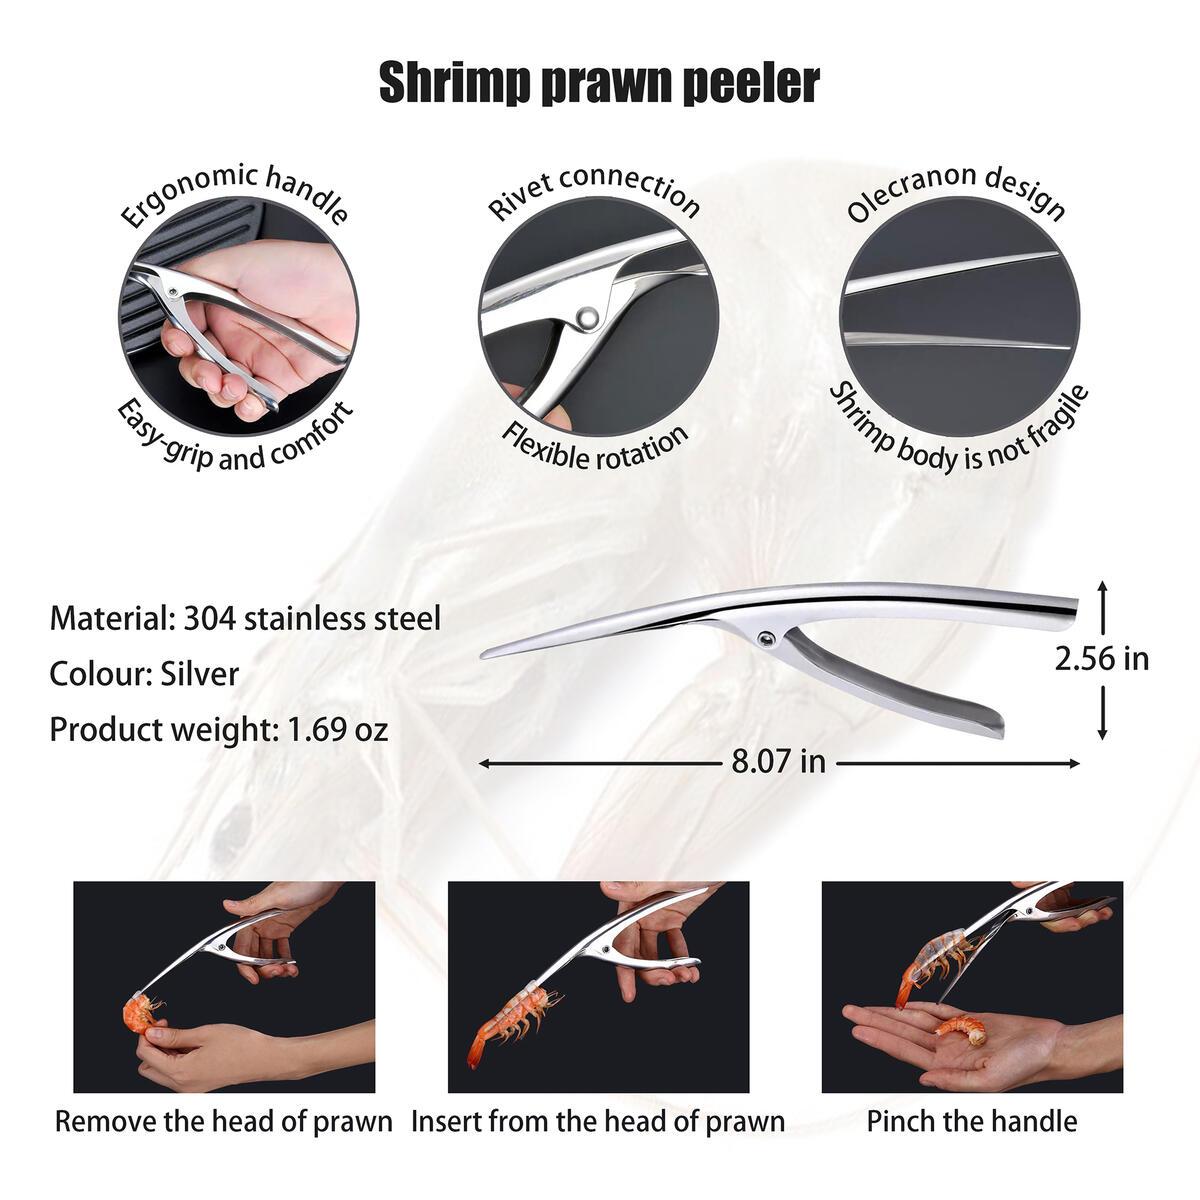 Professional Upscale Stainless Steel Seafood Tools 6pcs Set-1pcs Shrimp Prawn Peeler,1pcs Fish Scaler,1pcs Oyster Knife Shucker,1pcs Crab Cracker,1pcs Clam Opener,1pcs Seafood Scissors Lobster Shears